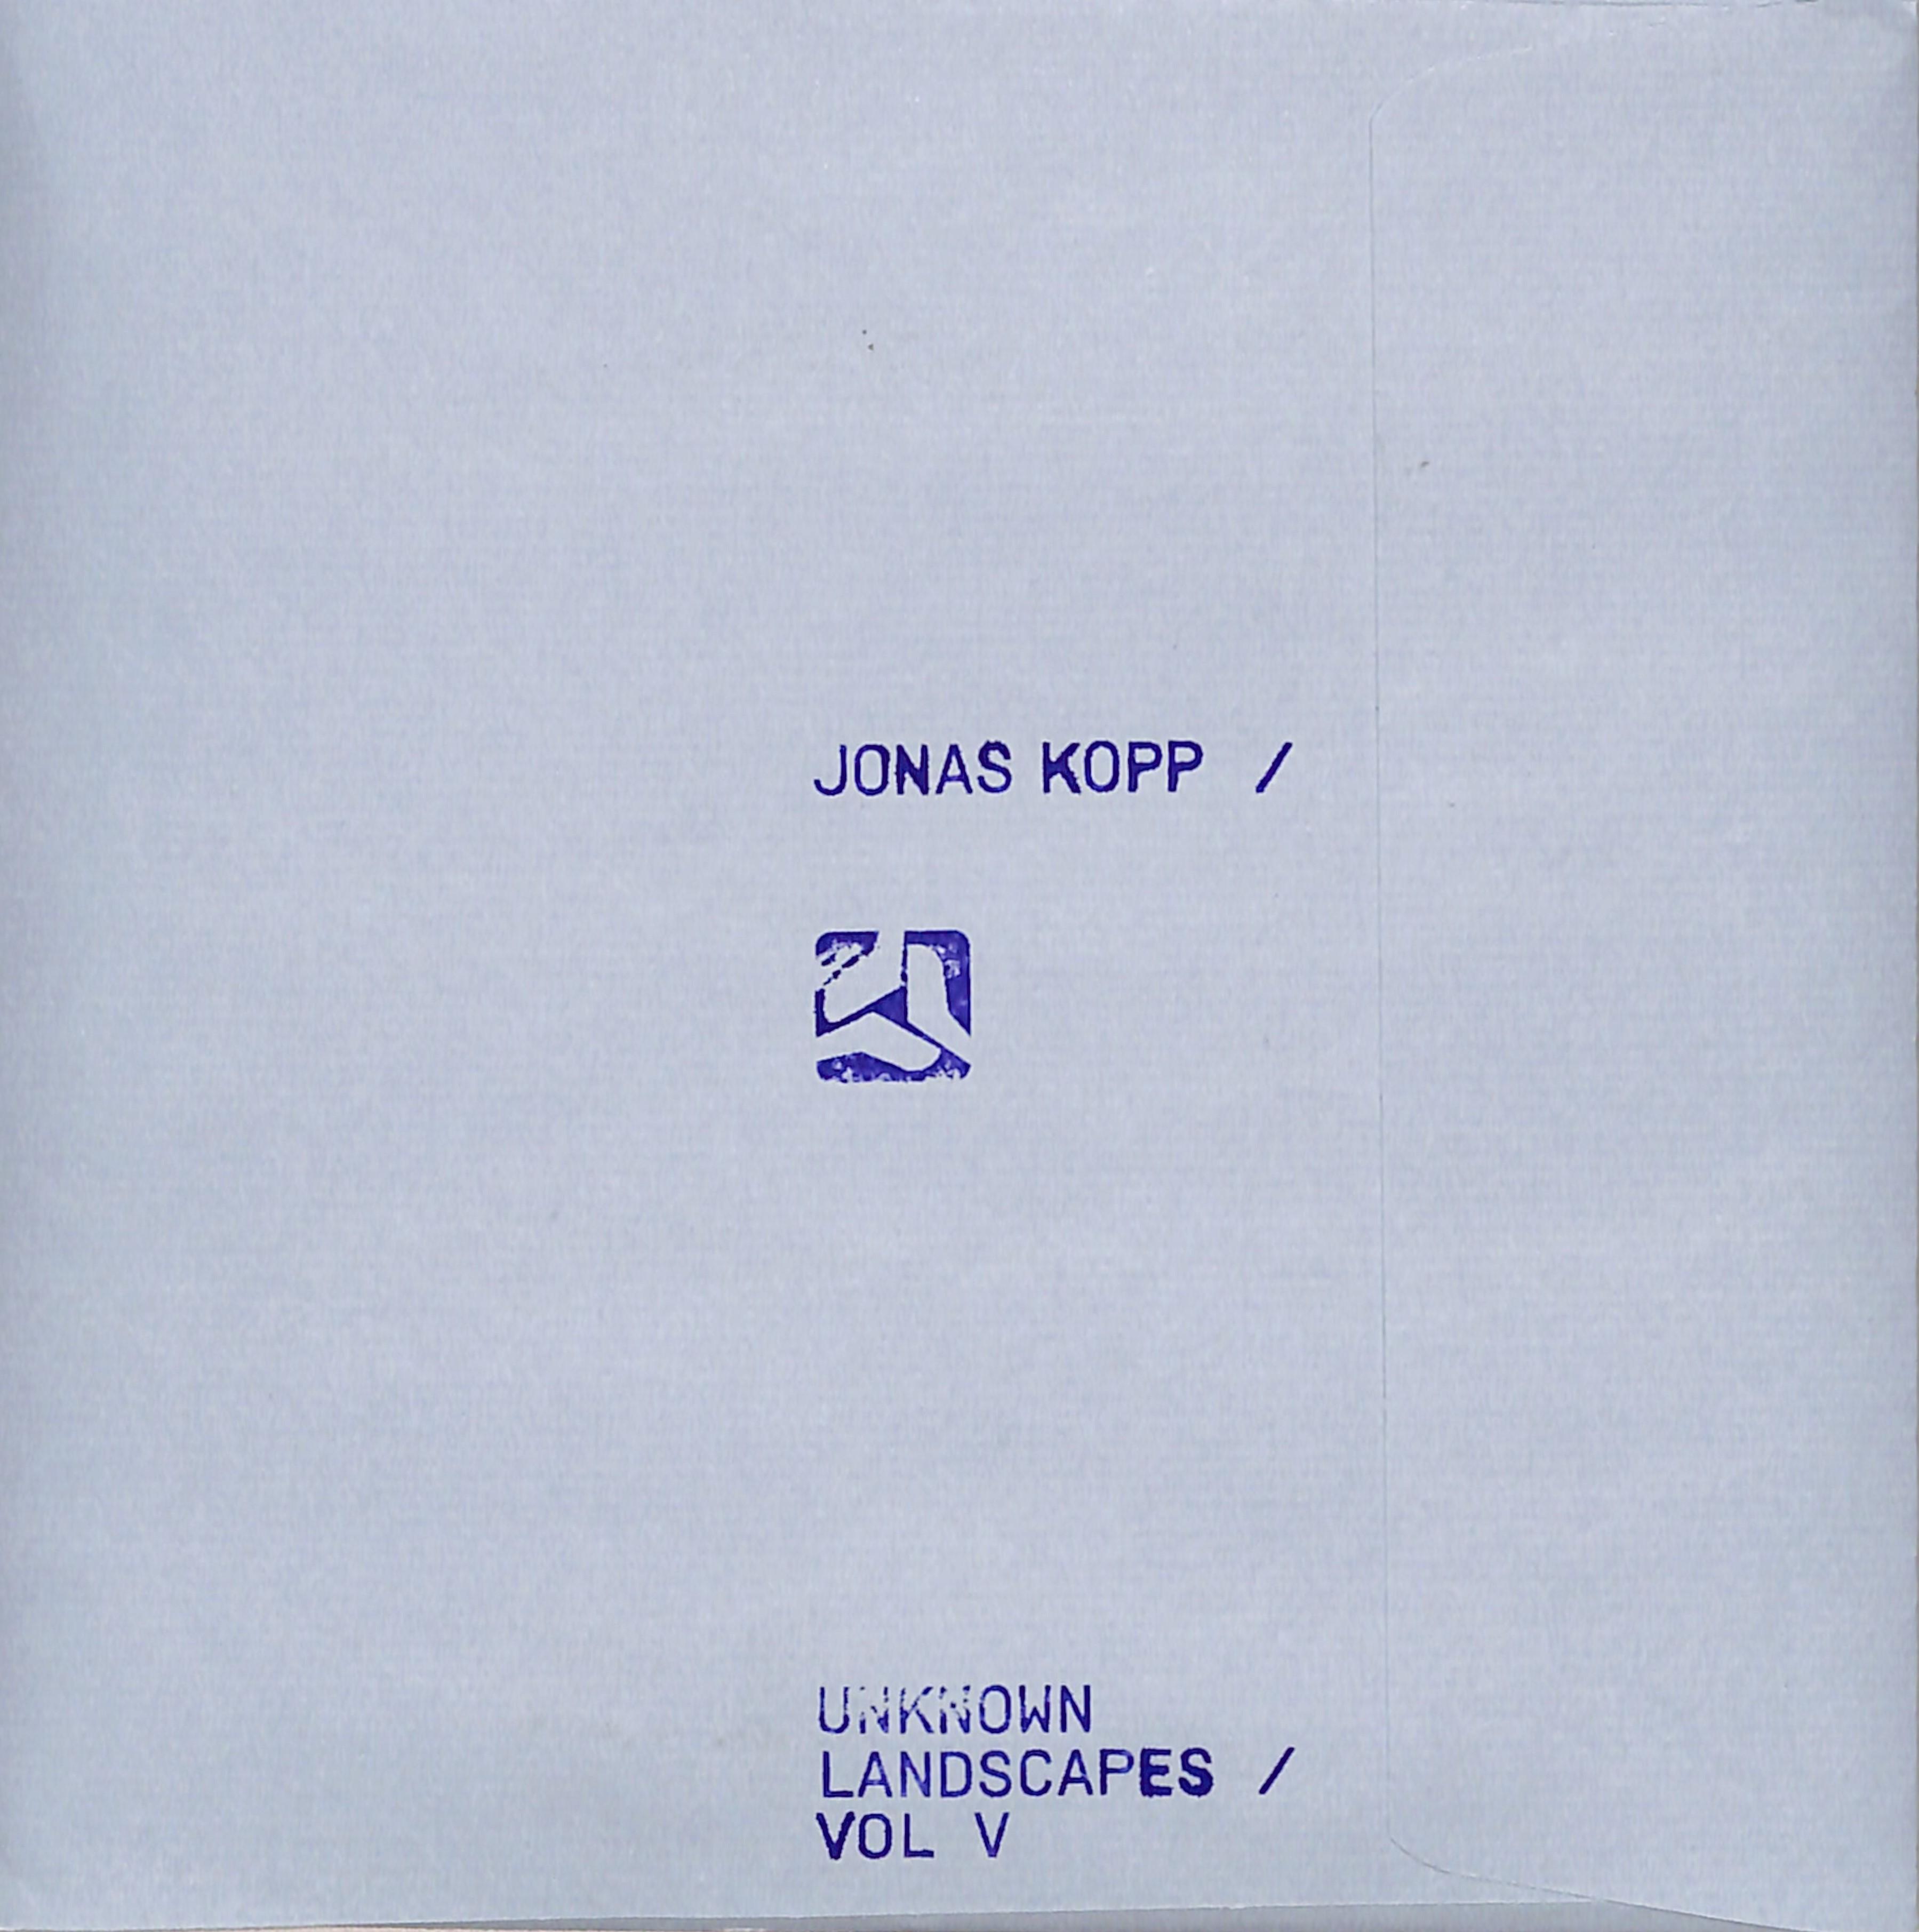 Jonas Kopp - UNKNOWN LANDSCAPES VOL. 5